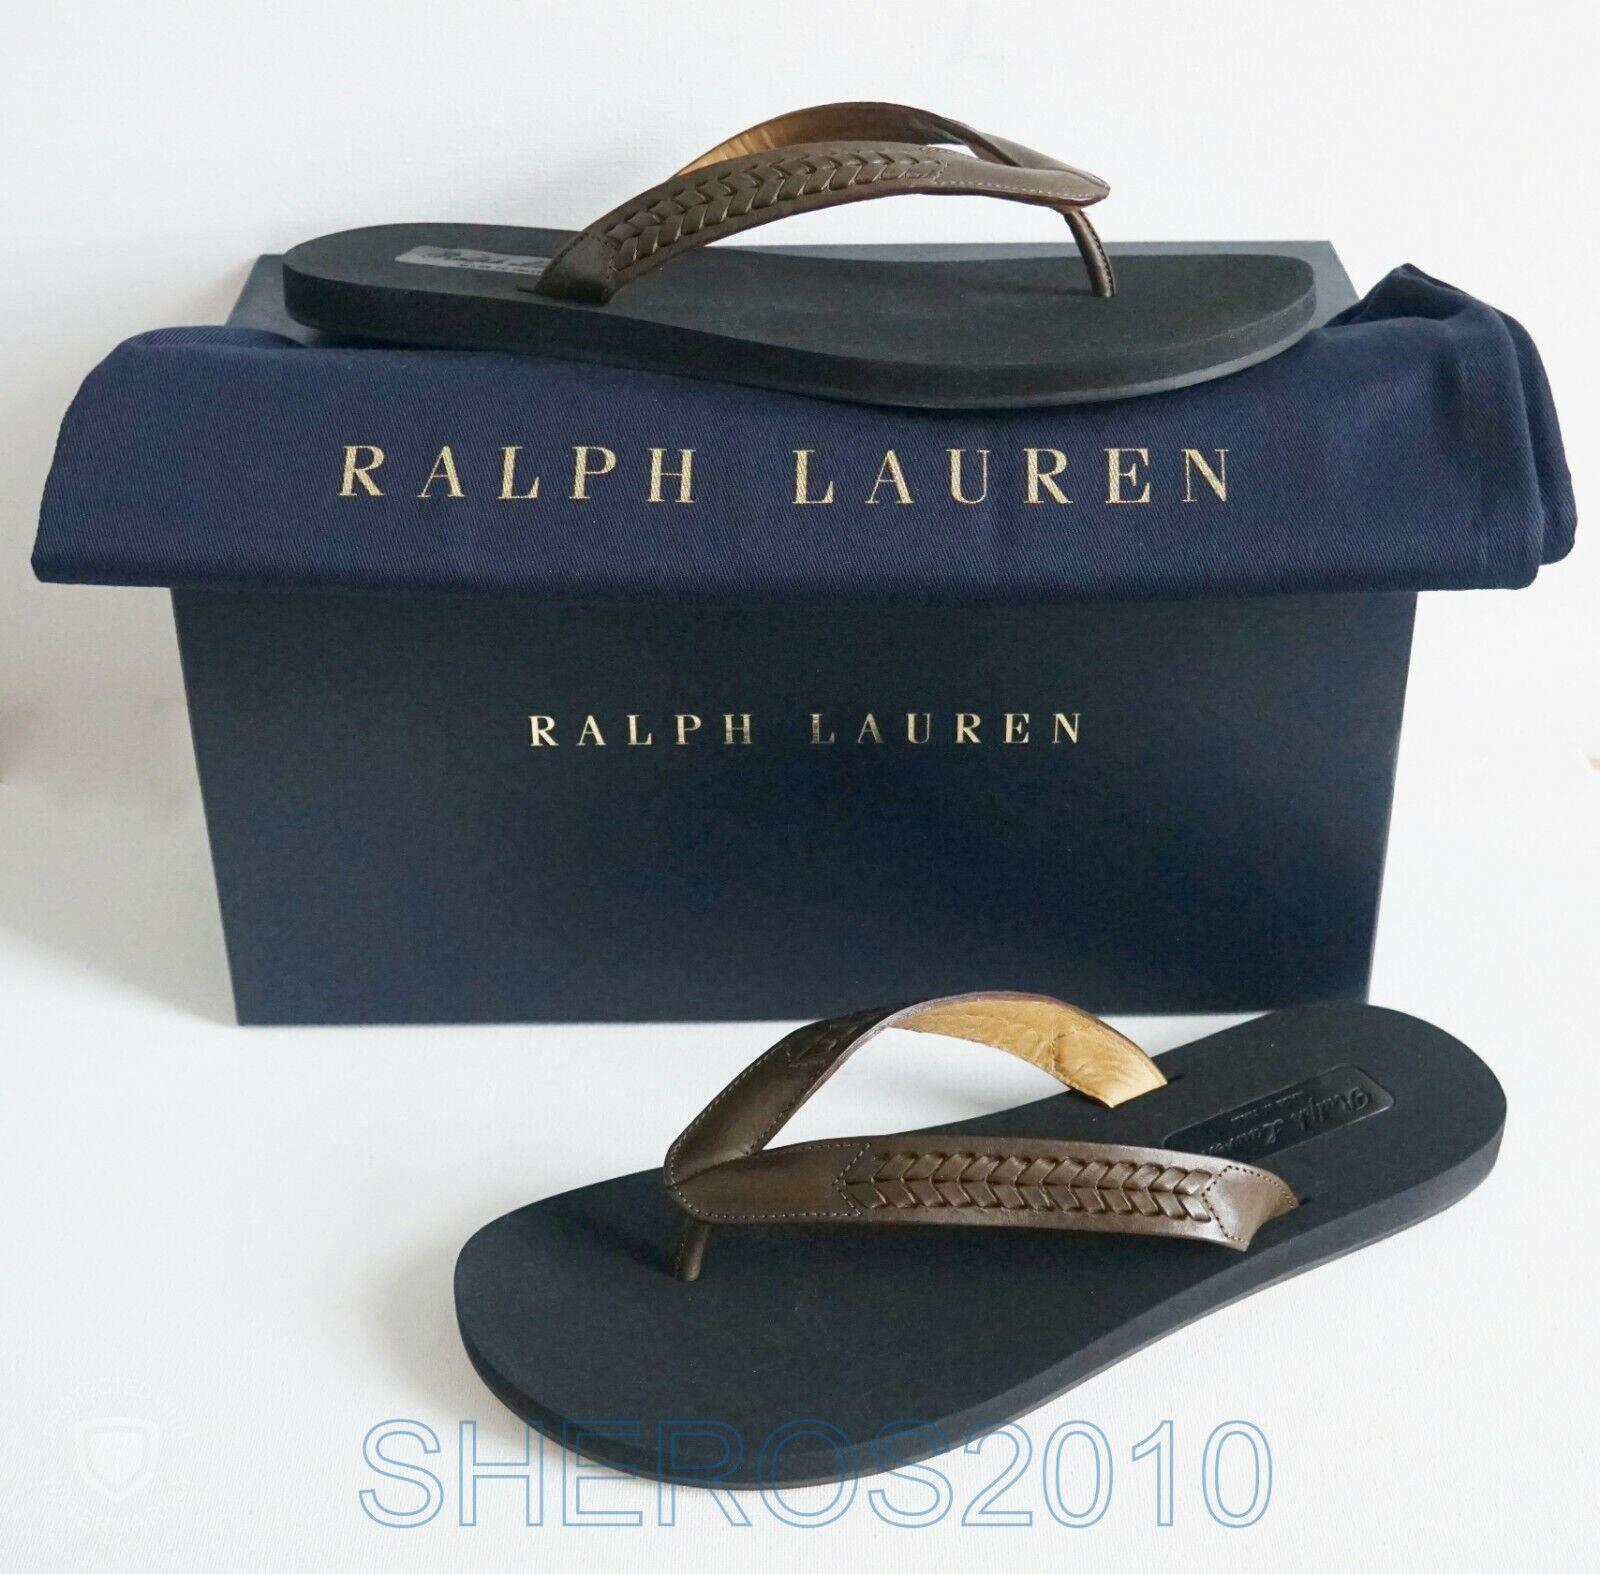 RALPH LAUREN púrpura LABEL VACHETTA Leather Thong Sandals zapatos US-7 EUR-40